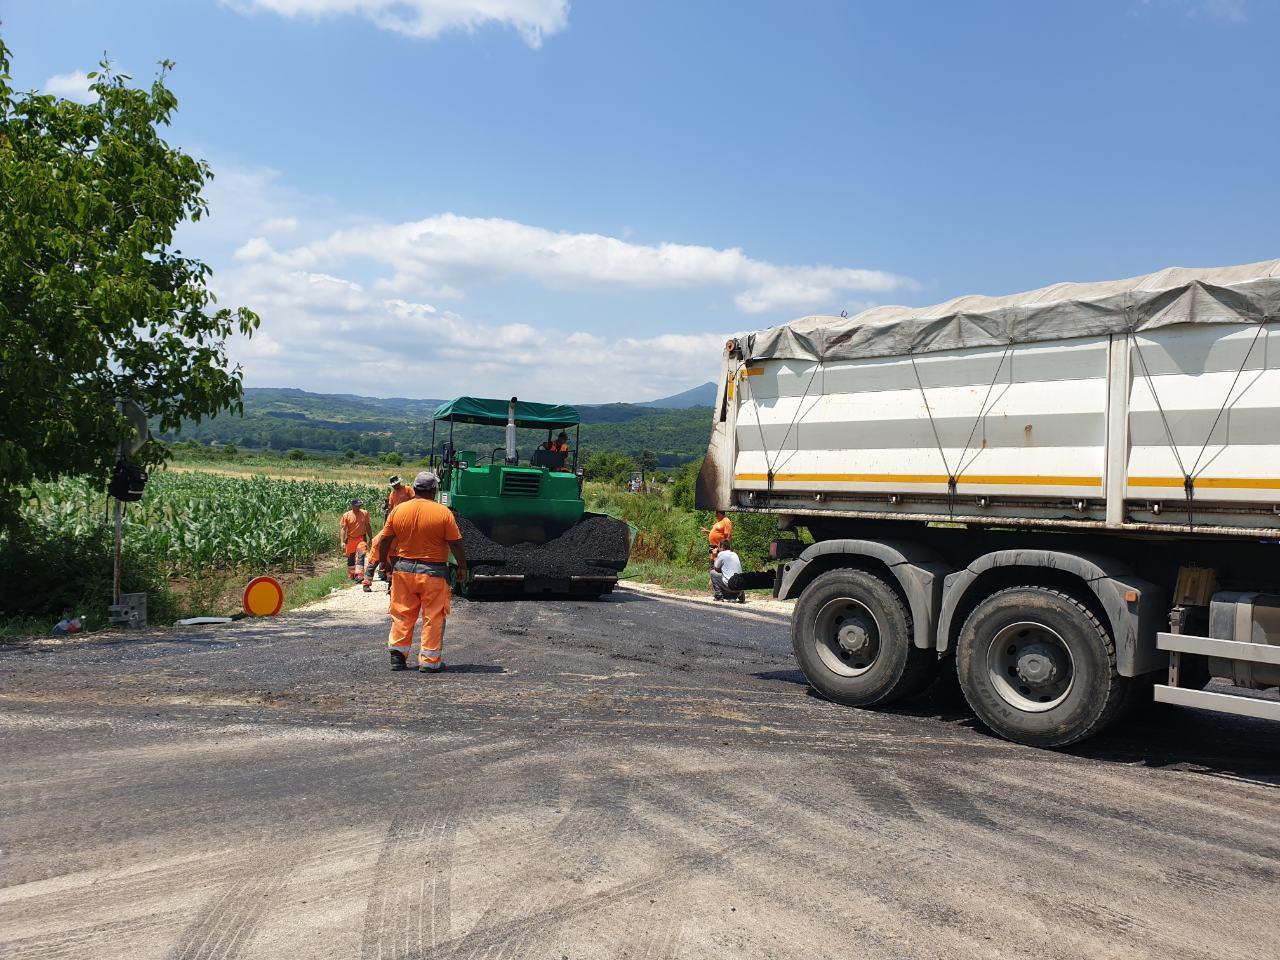 Radovi, asfaltiranje, foto: M.N.